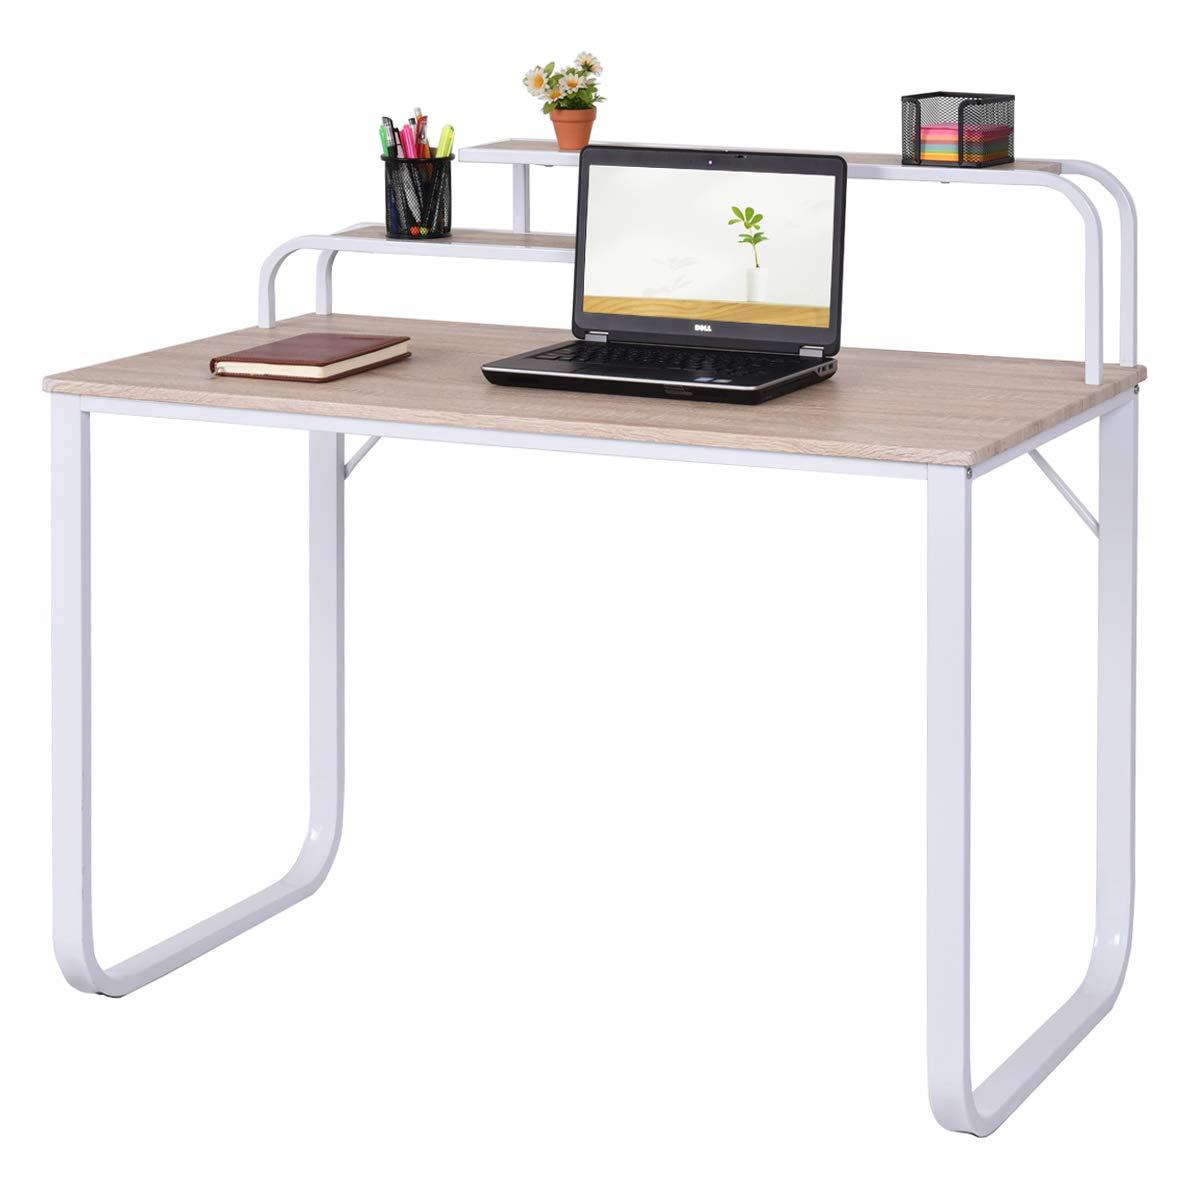 Amazoncom Tangkula Computer Desk Laptop Writing Desk Student Study